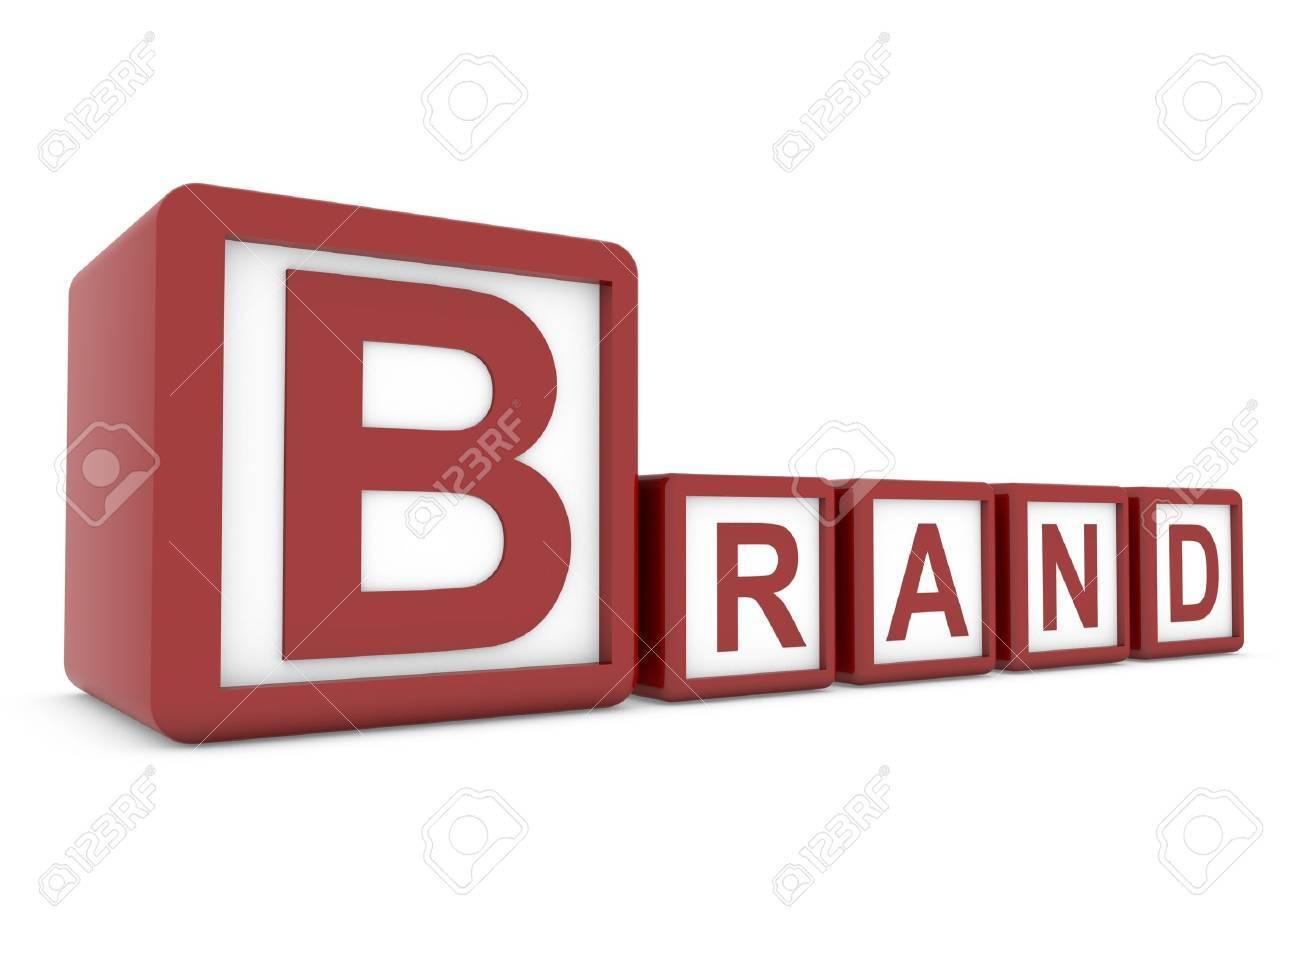 brand on boxes Stock Photo - 11778859